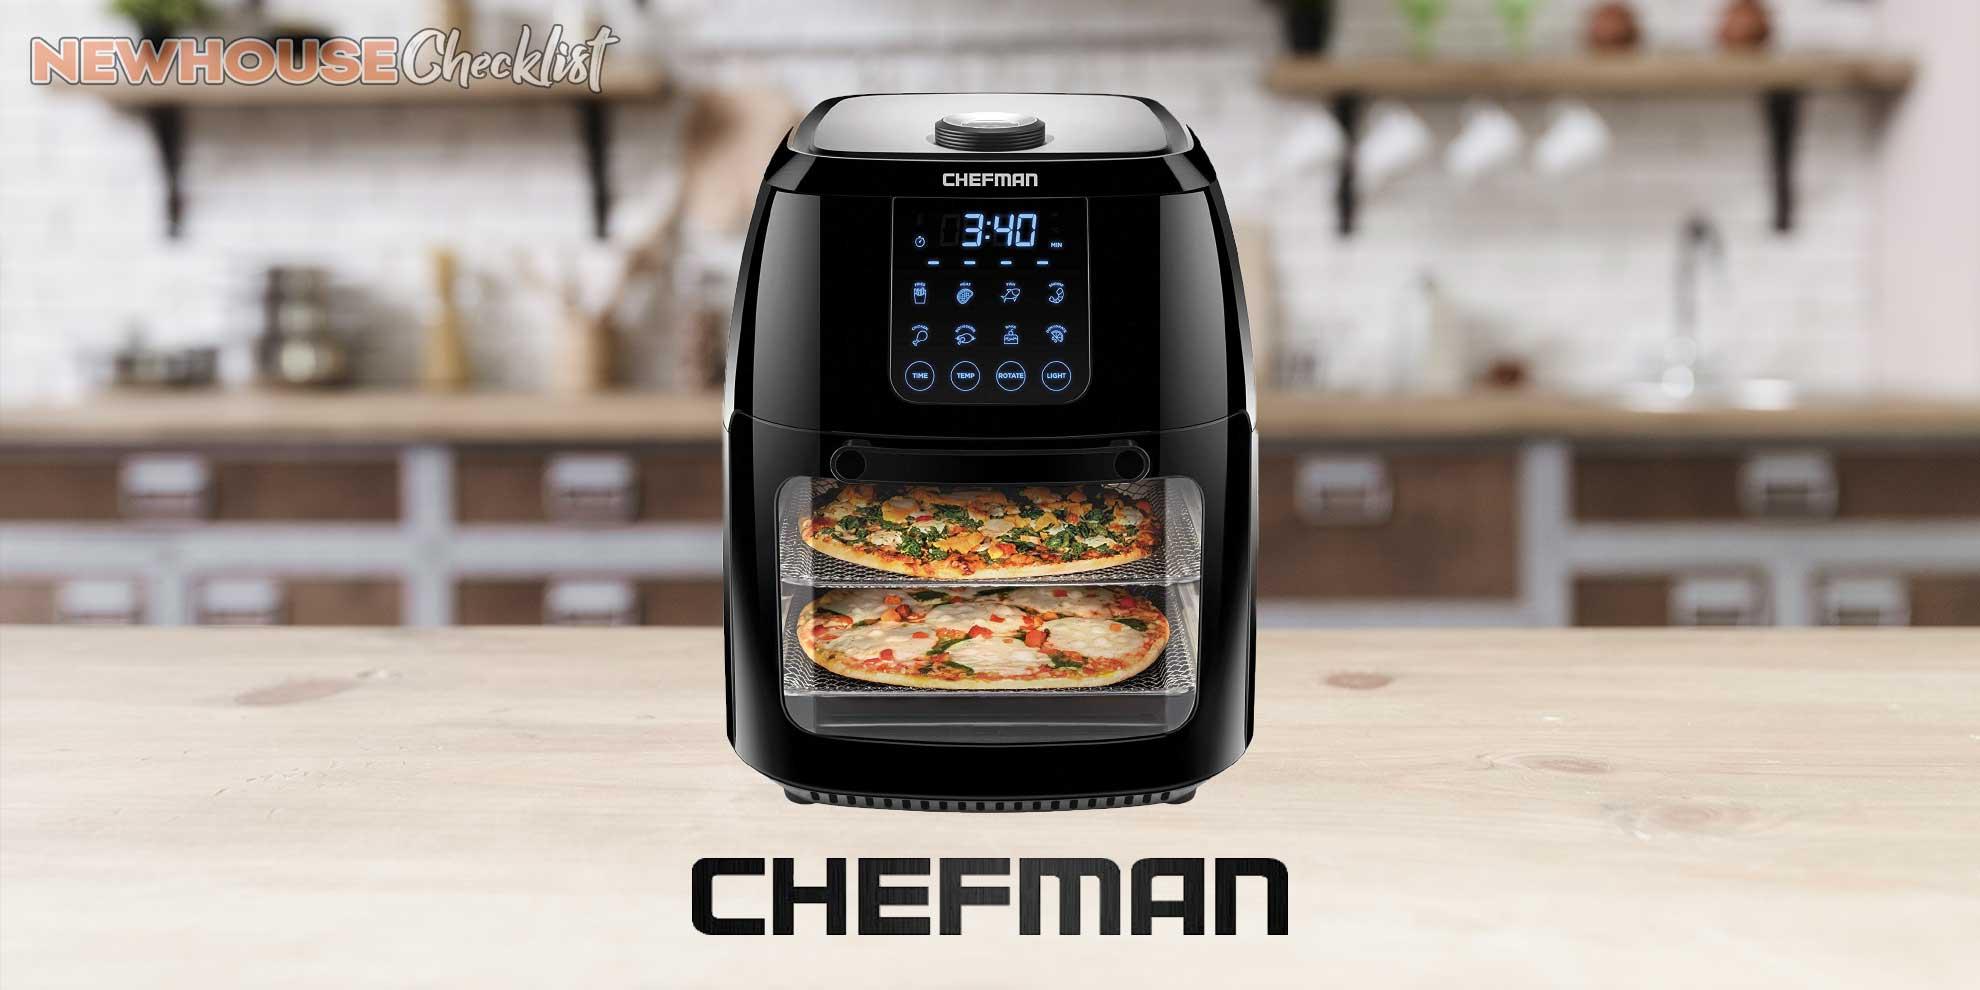 Chefman Air Fryer With Rotisserie